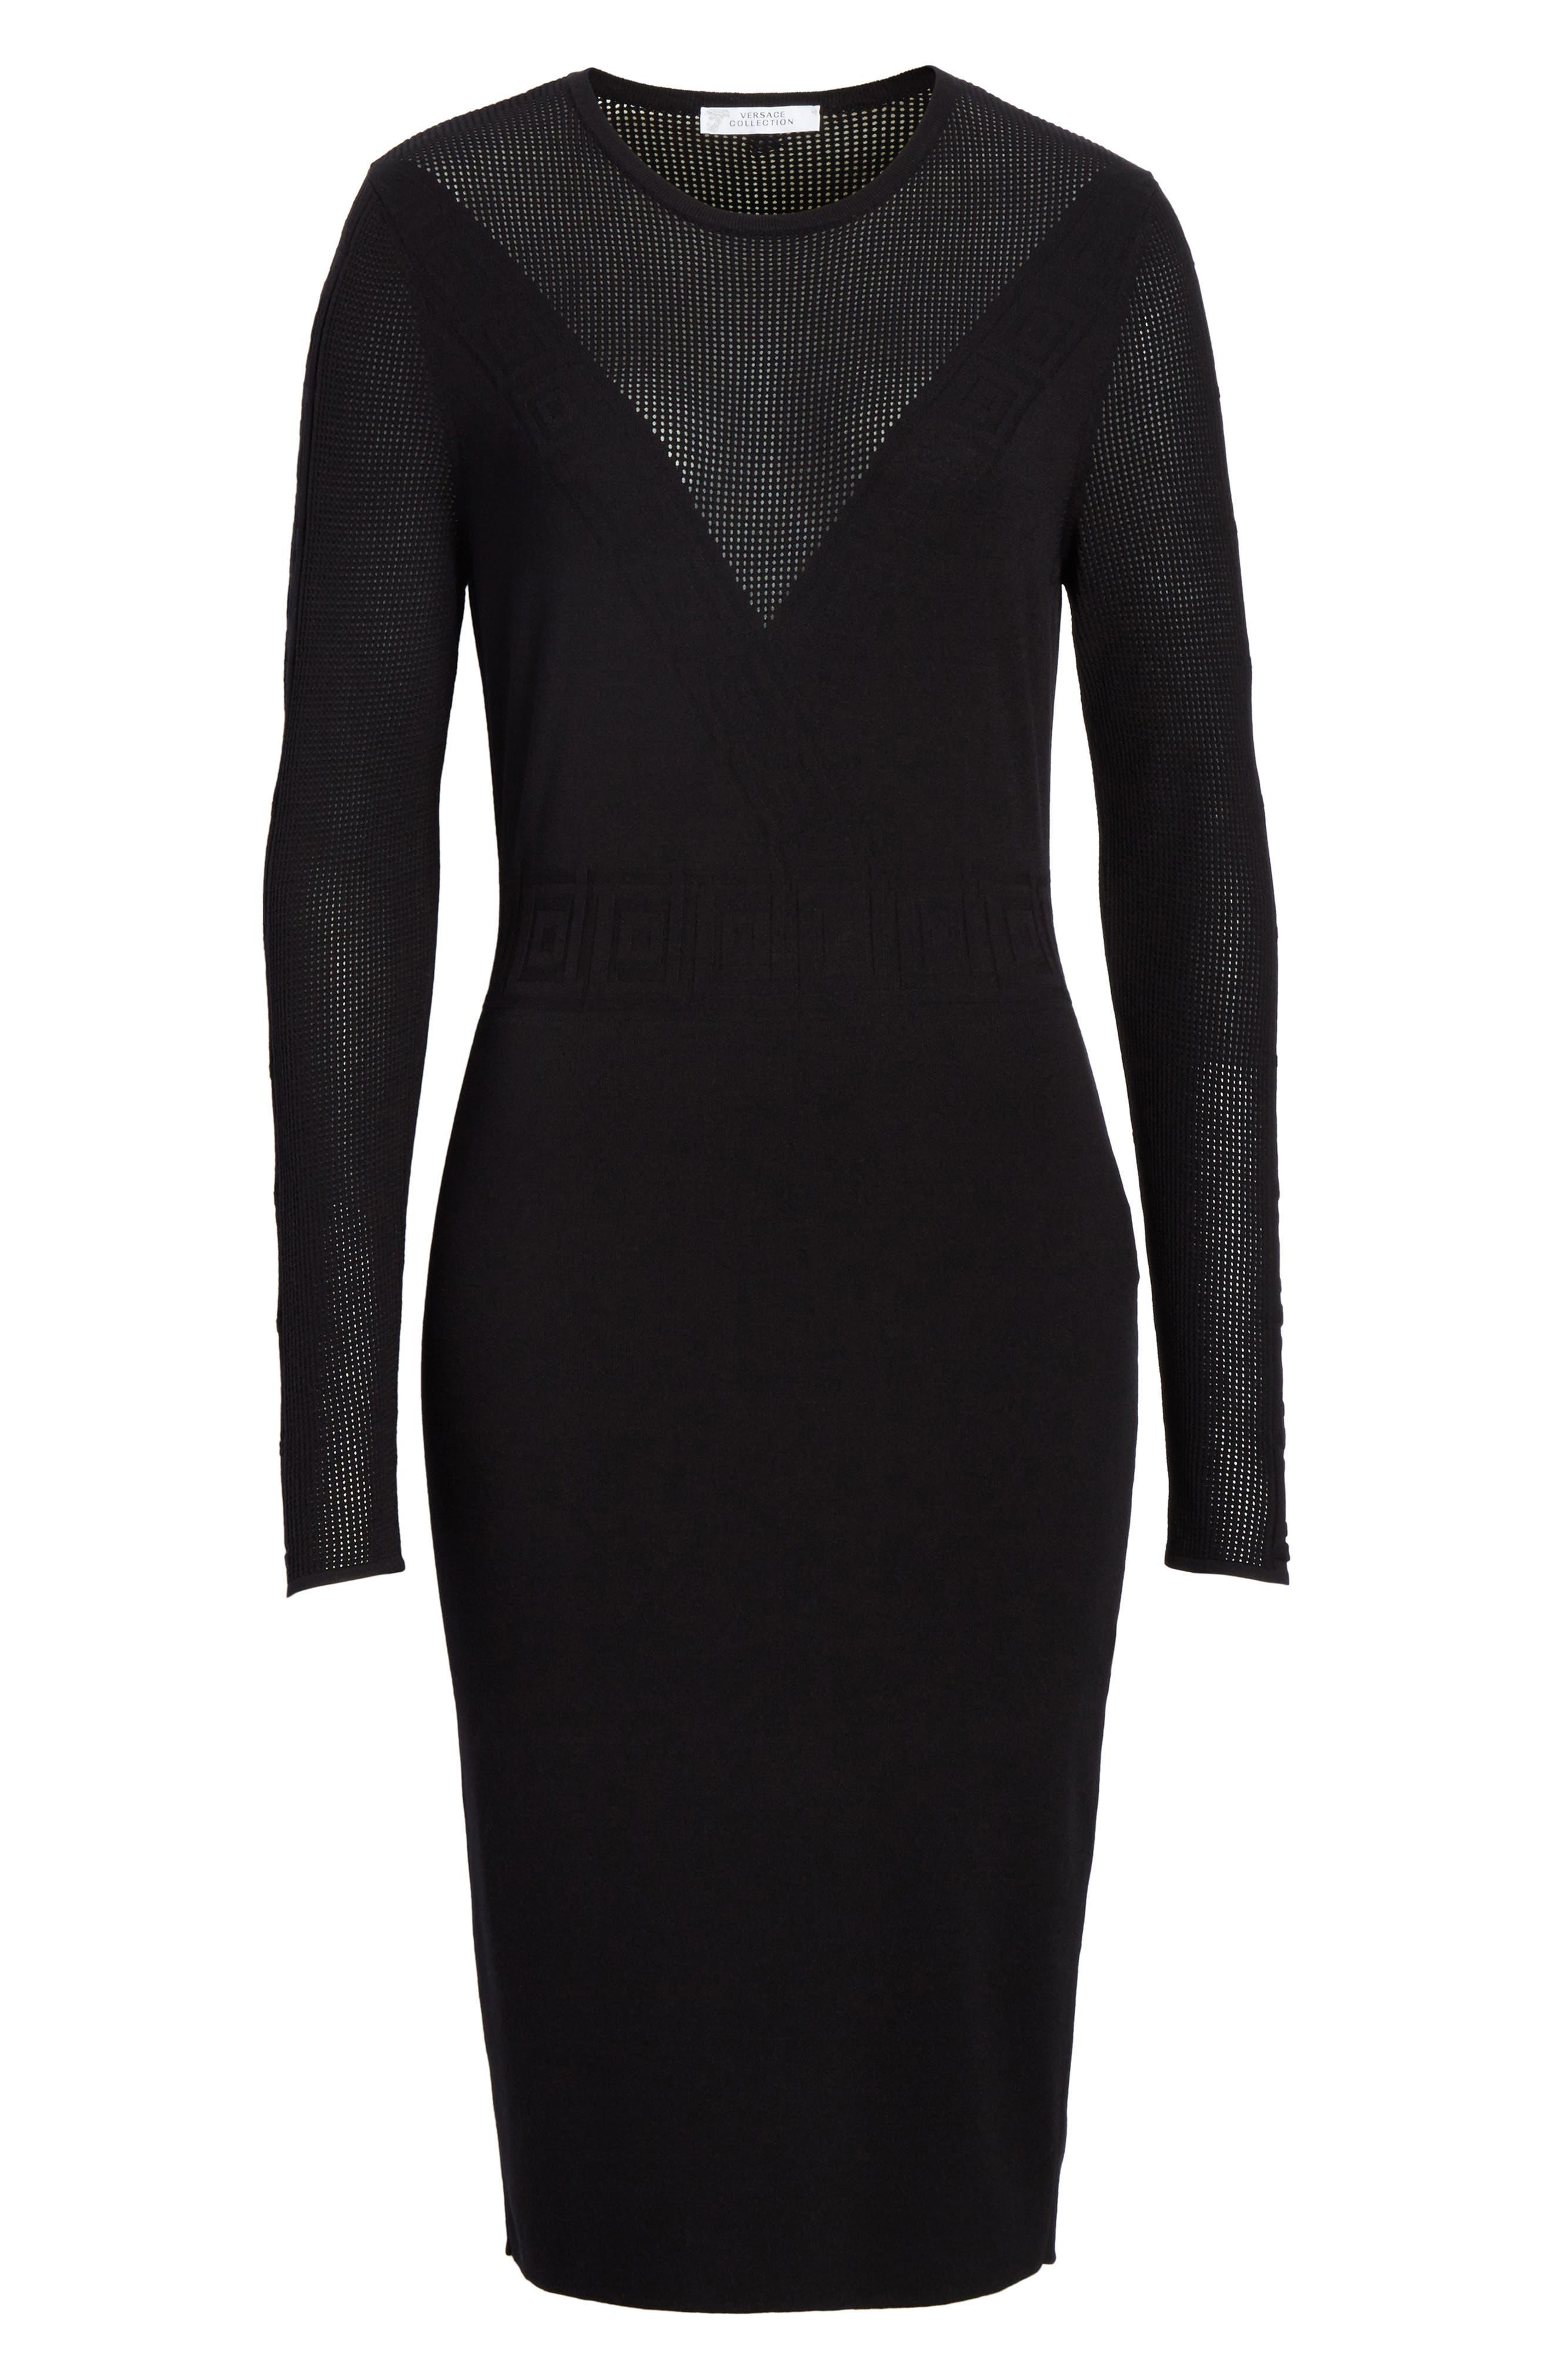 Sheer Detail Knit Dress,                             Alternate thumbnail 7, color,                             Black